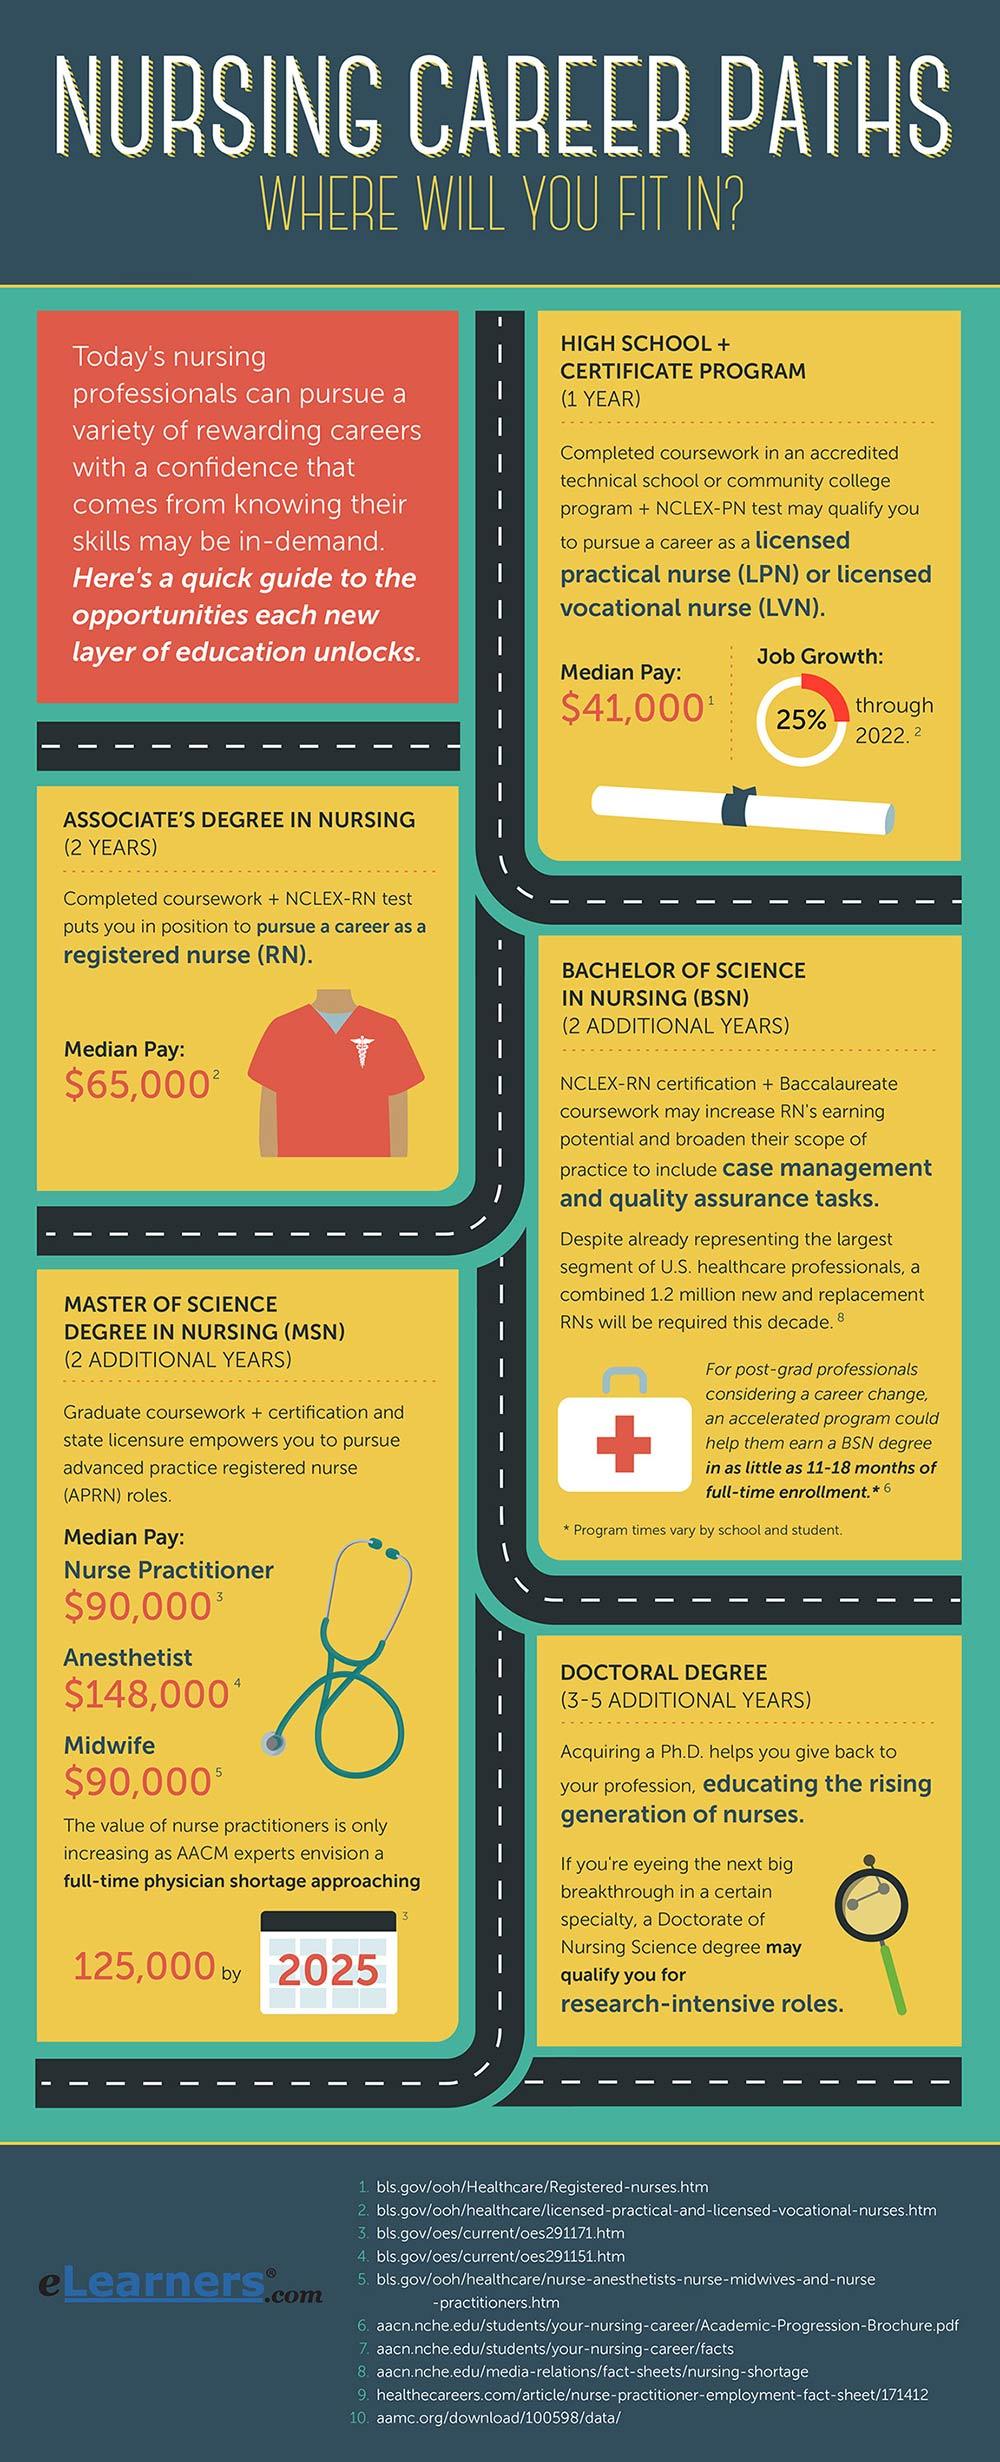 Nursing Career Path nursing career paths jobs for nursing ...